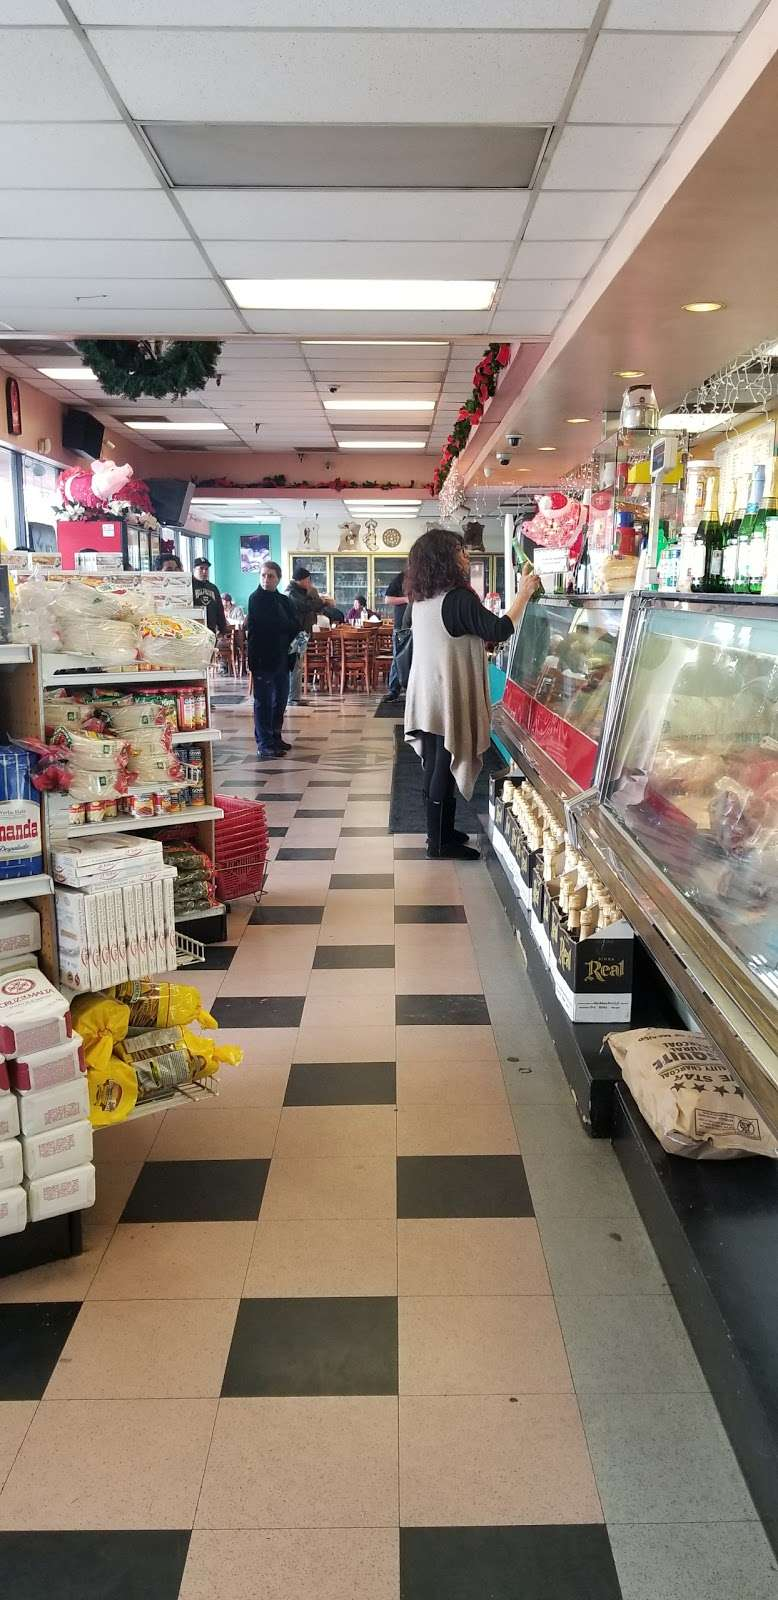 Titos Market - restaurant    Photo 5 of 10   Address: 9814 Garvey Ave #15, El Monte, CA 91733, USA   Phone: (626) 579-1893